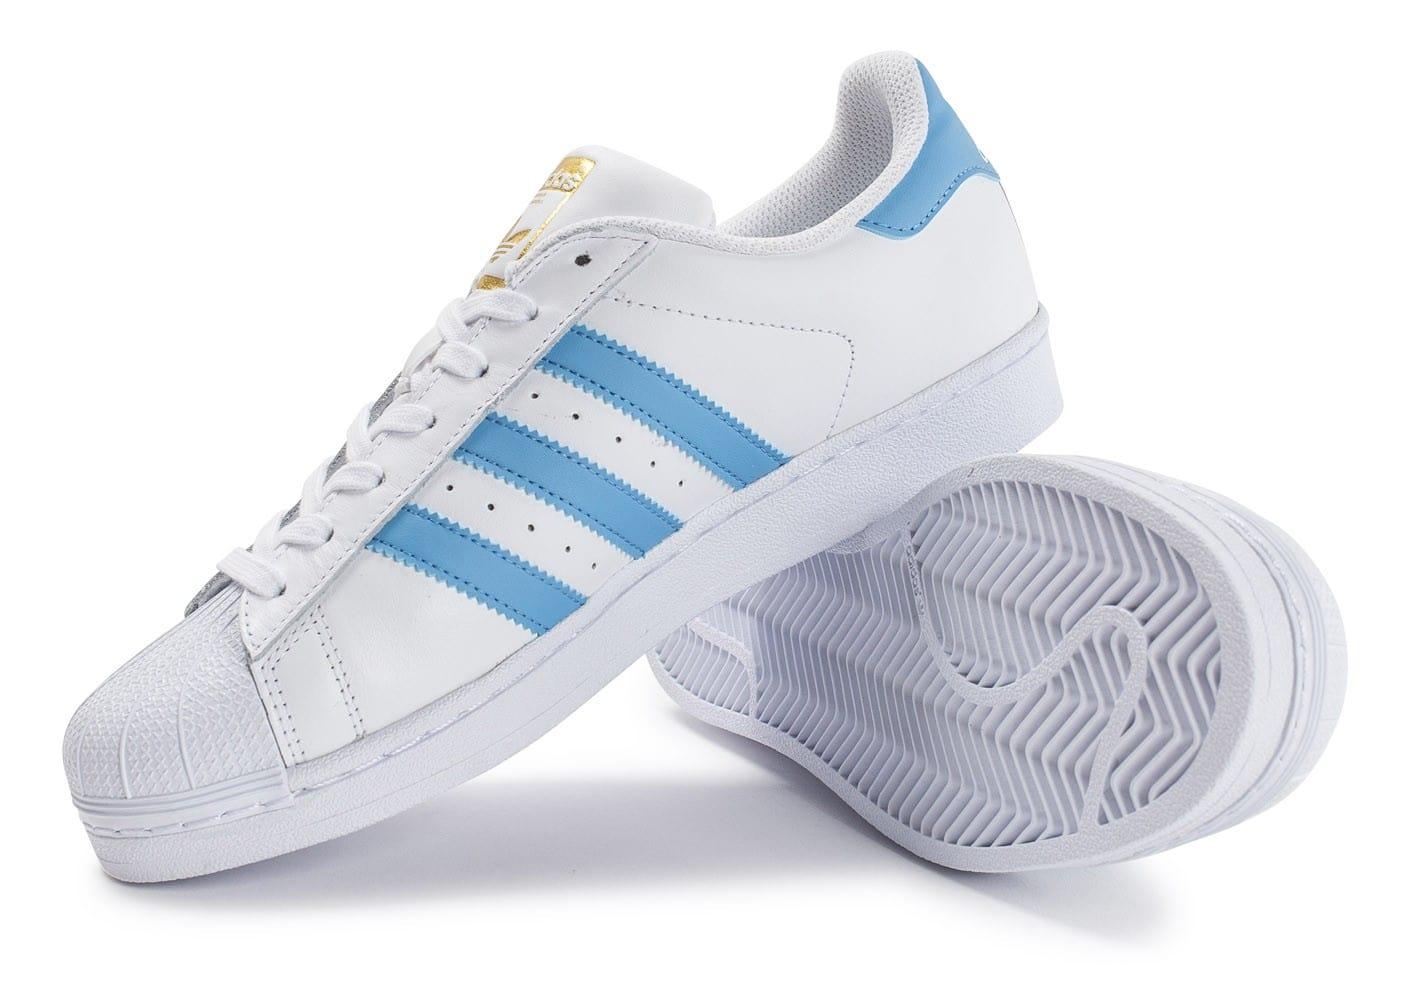 adidas superstar bleu ciel allow project.eu